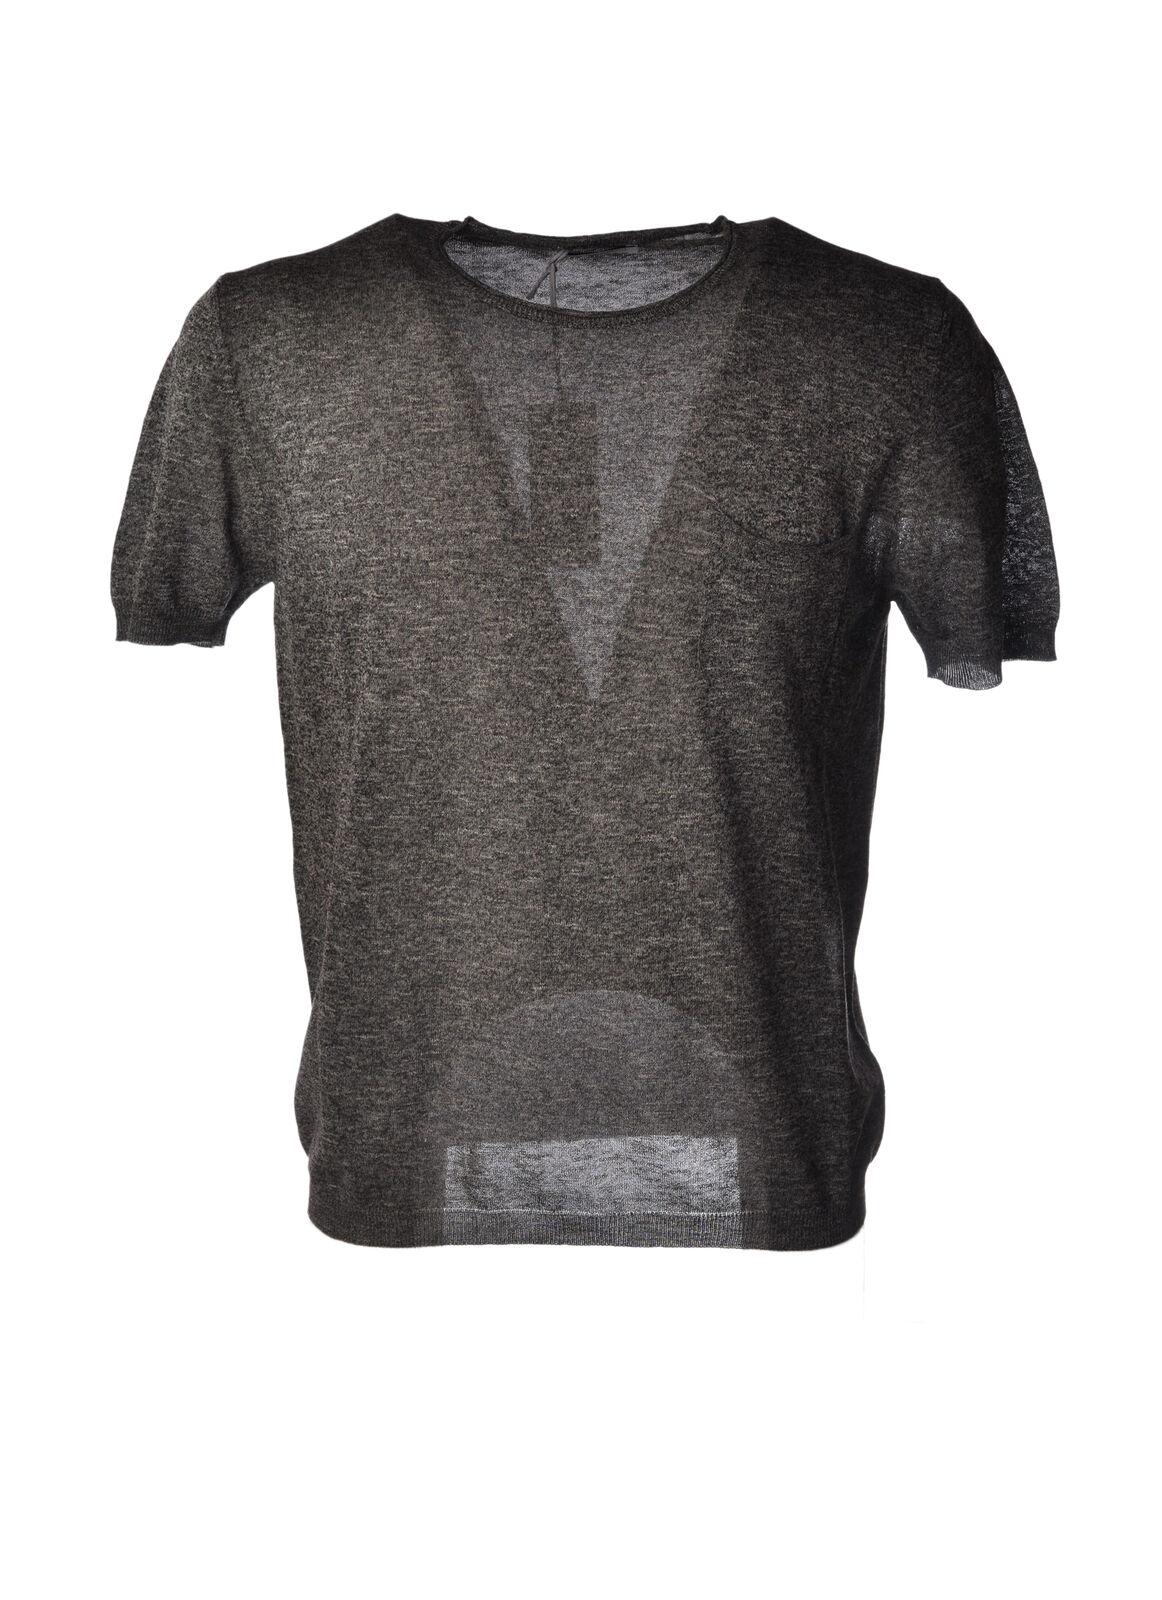 Heritage - Knitwear-Sweaters - Man - Grau - 5024005C181611